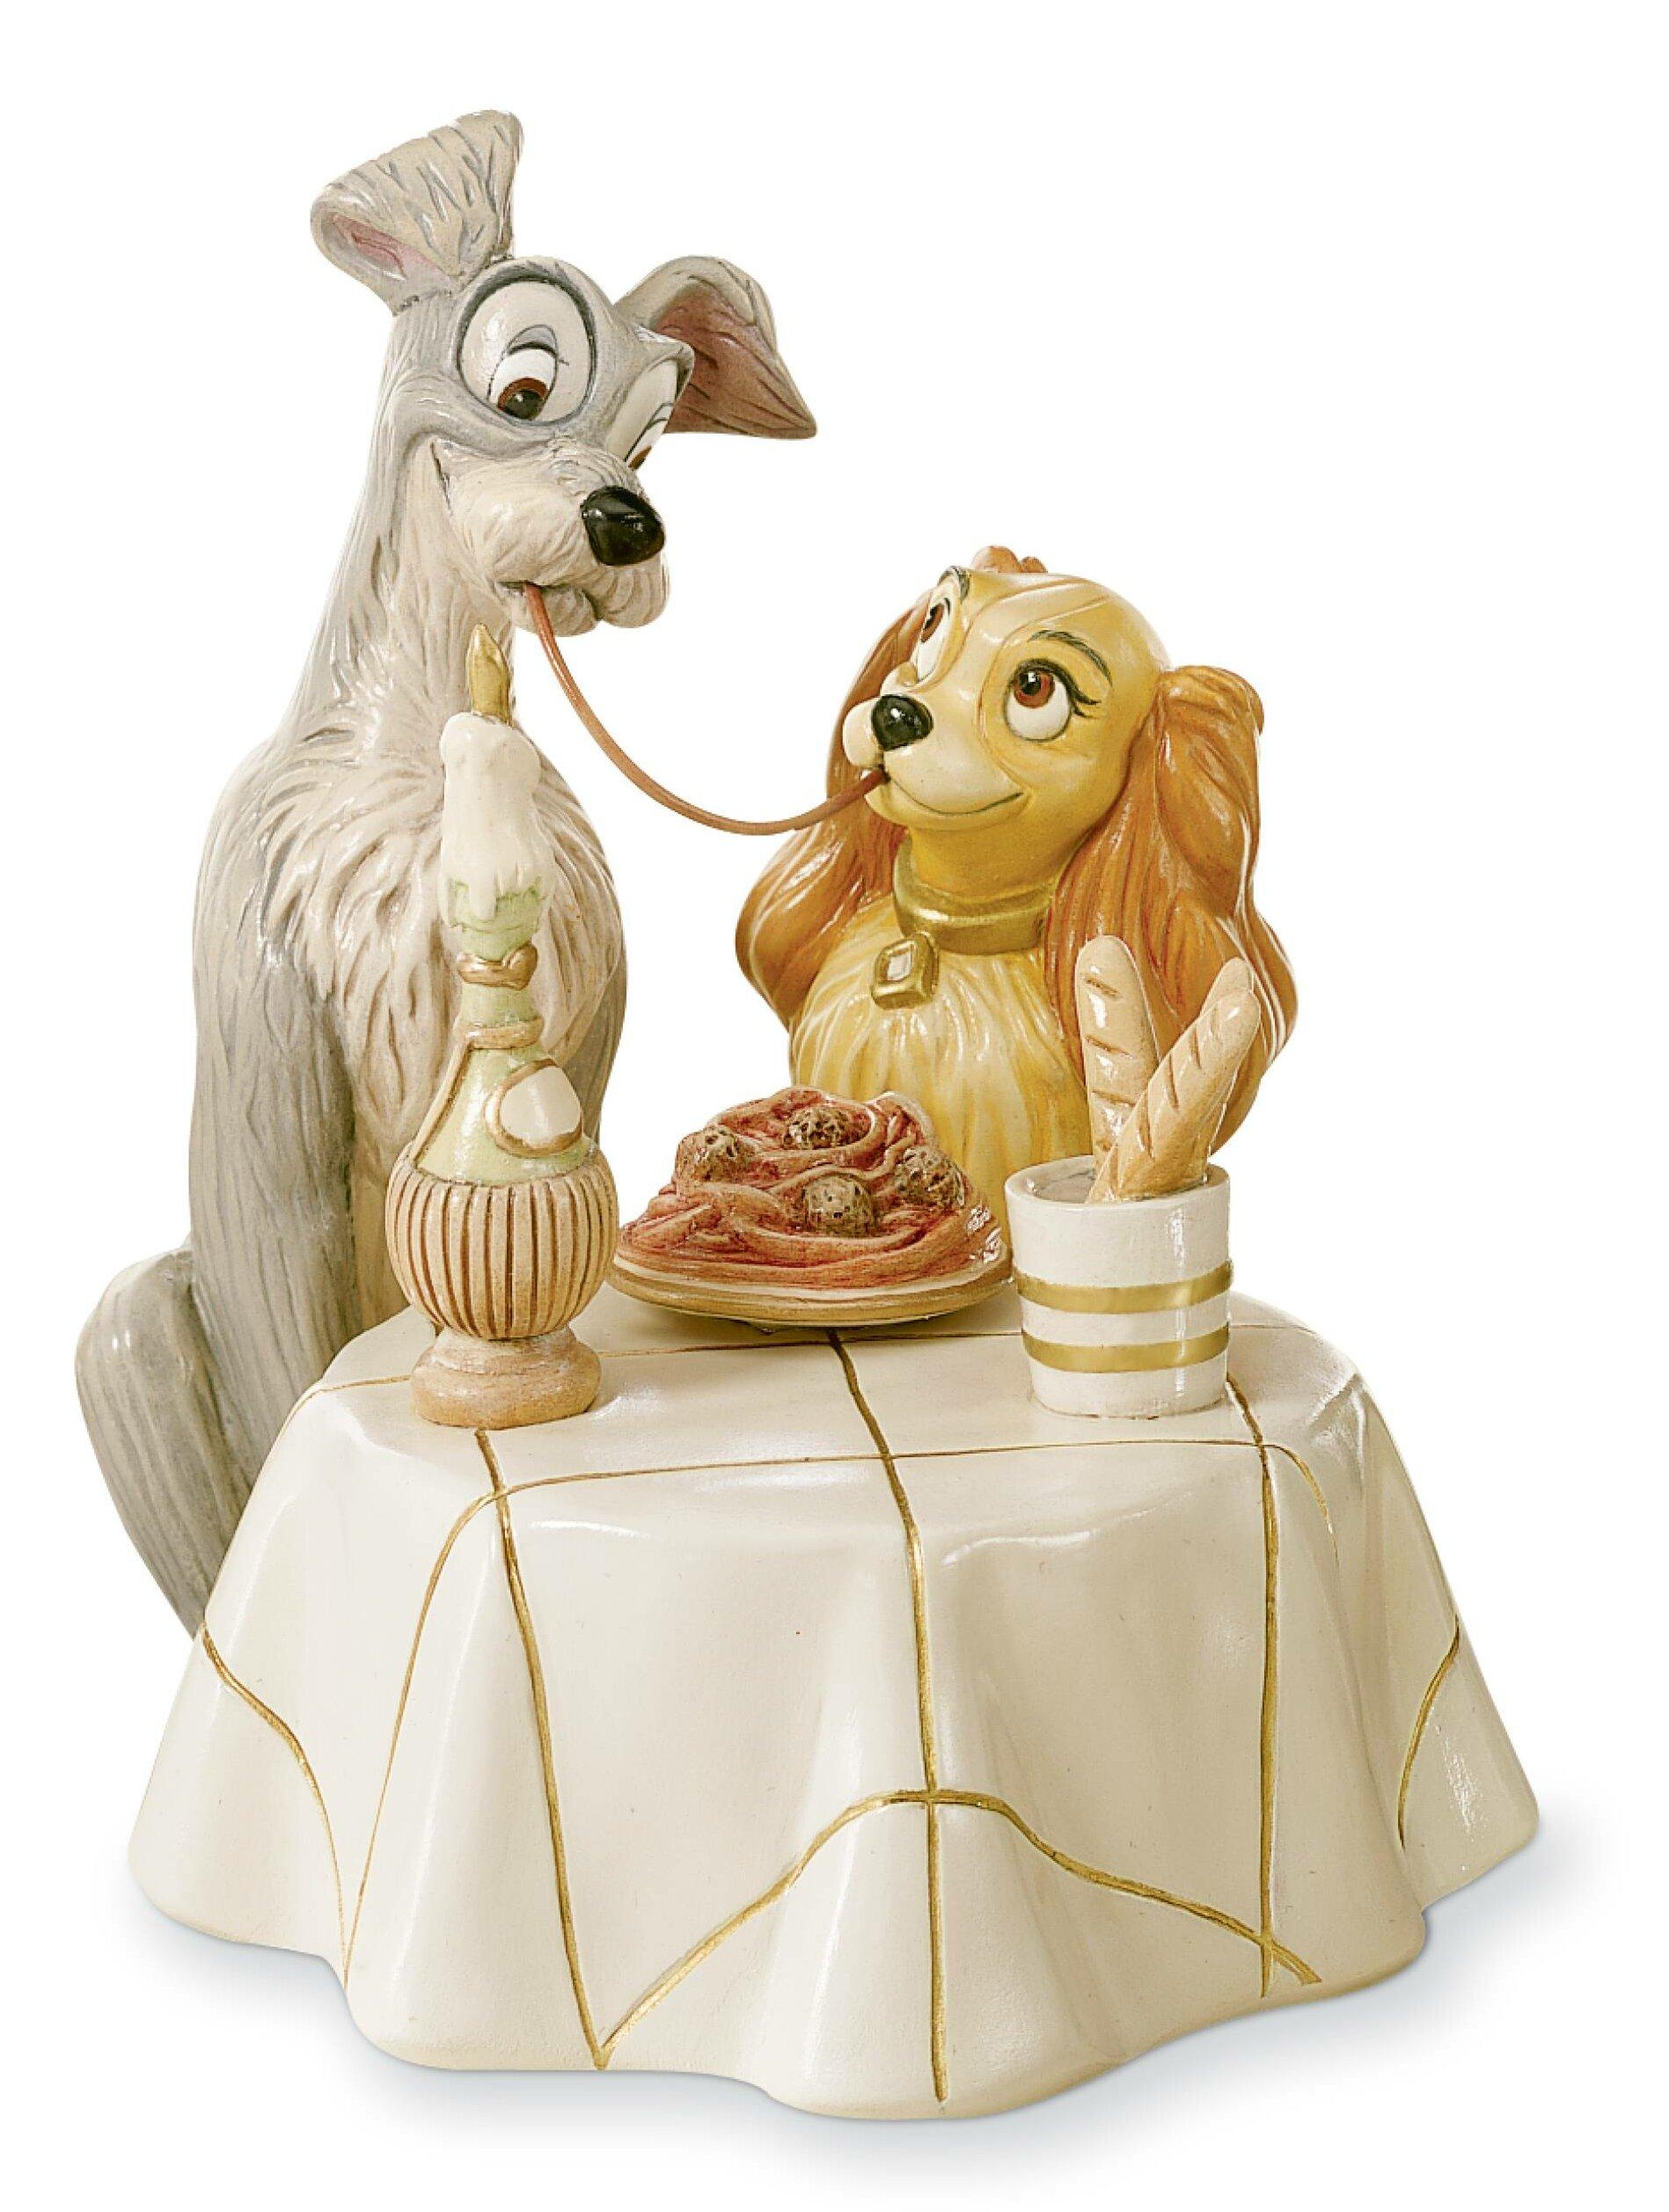 Lenox Disney S Lady And The Tramp Figurine Reviews Wayfair